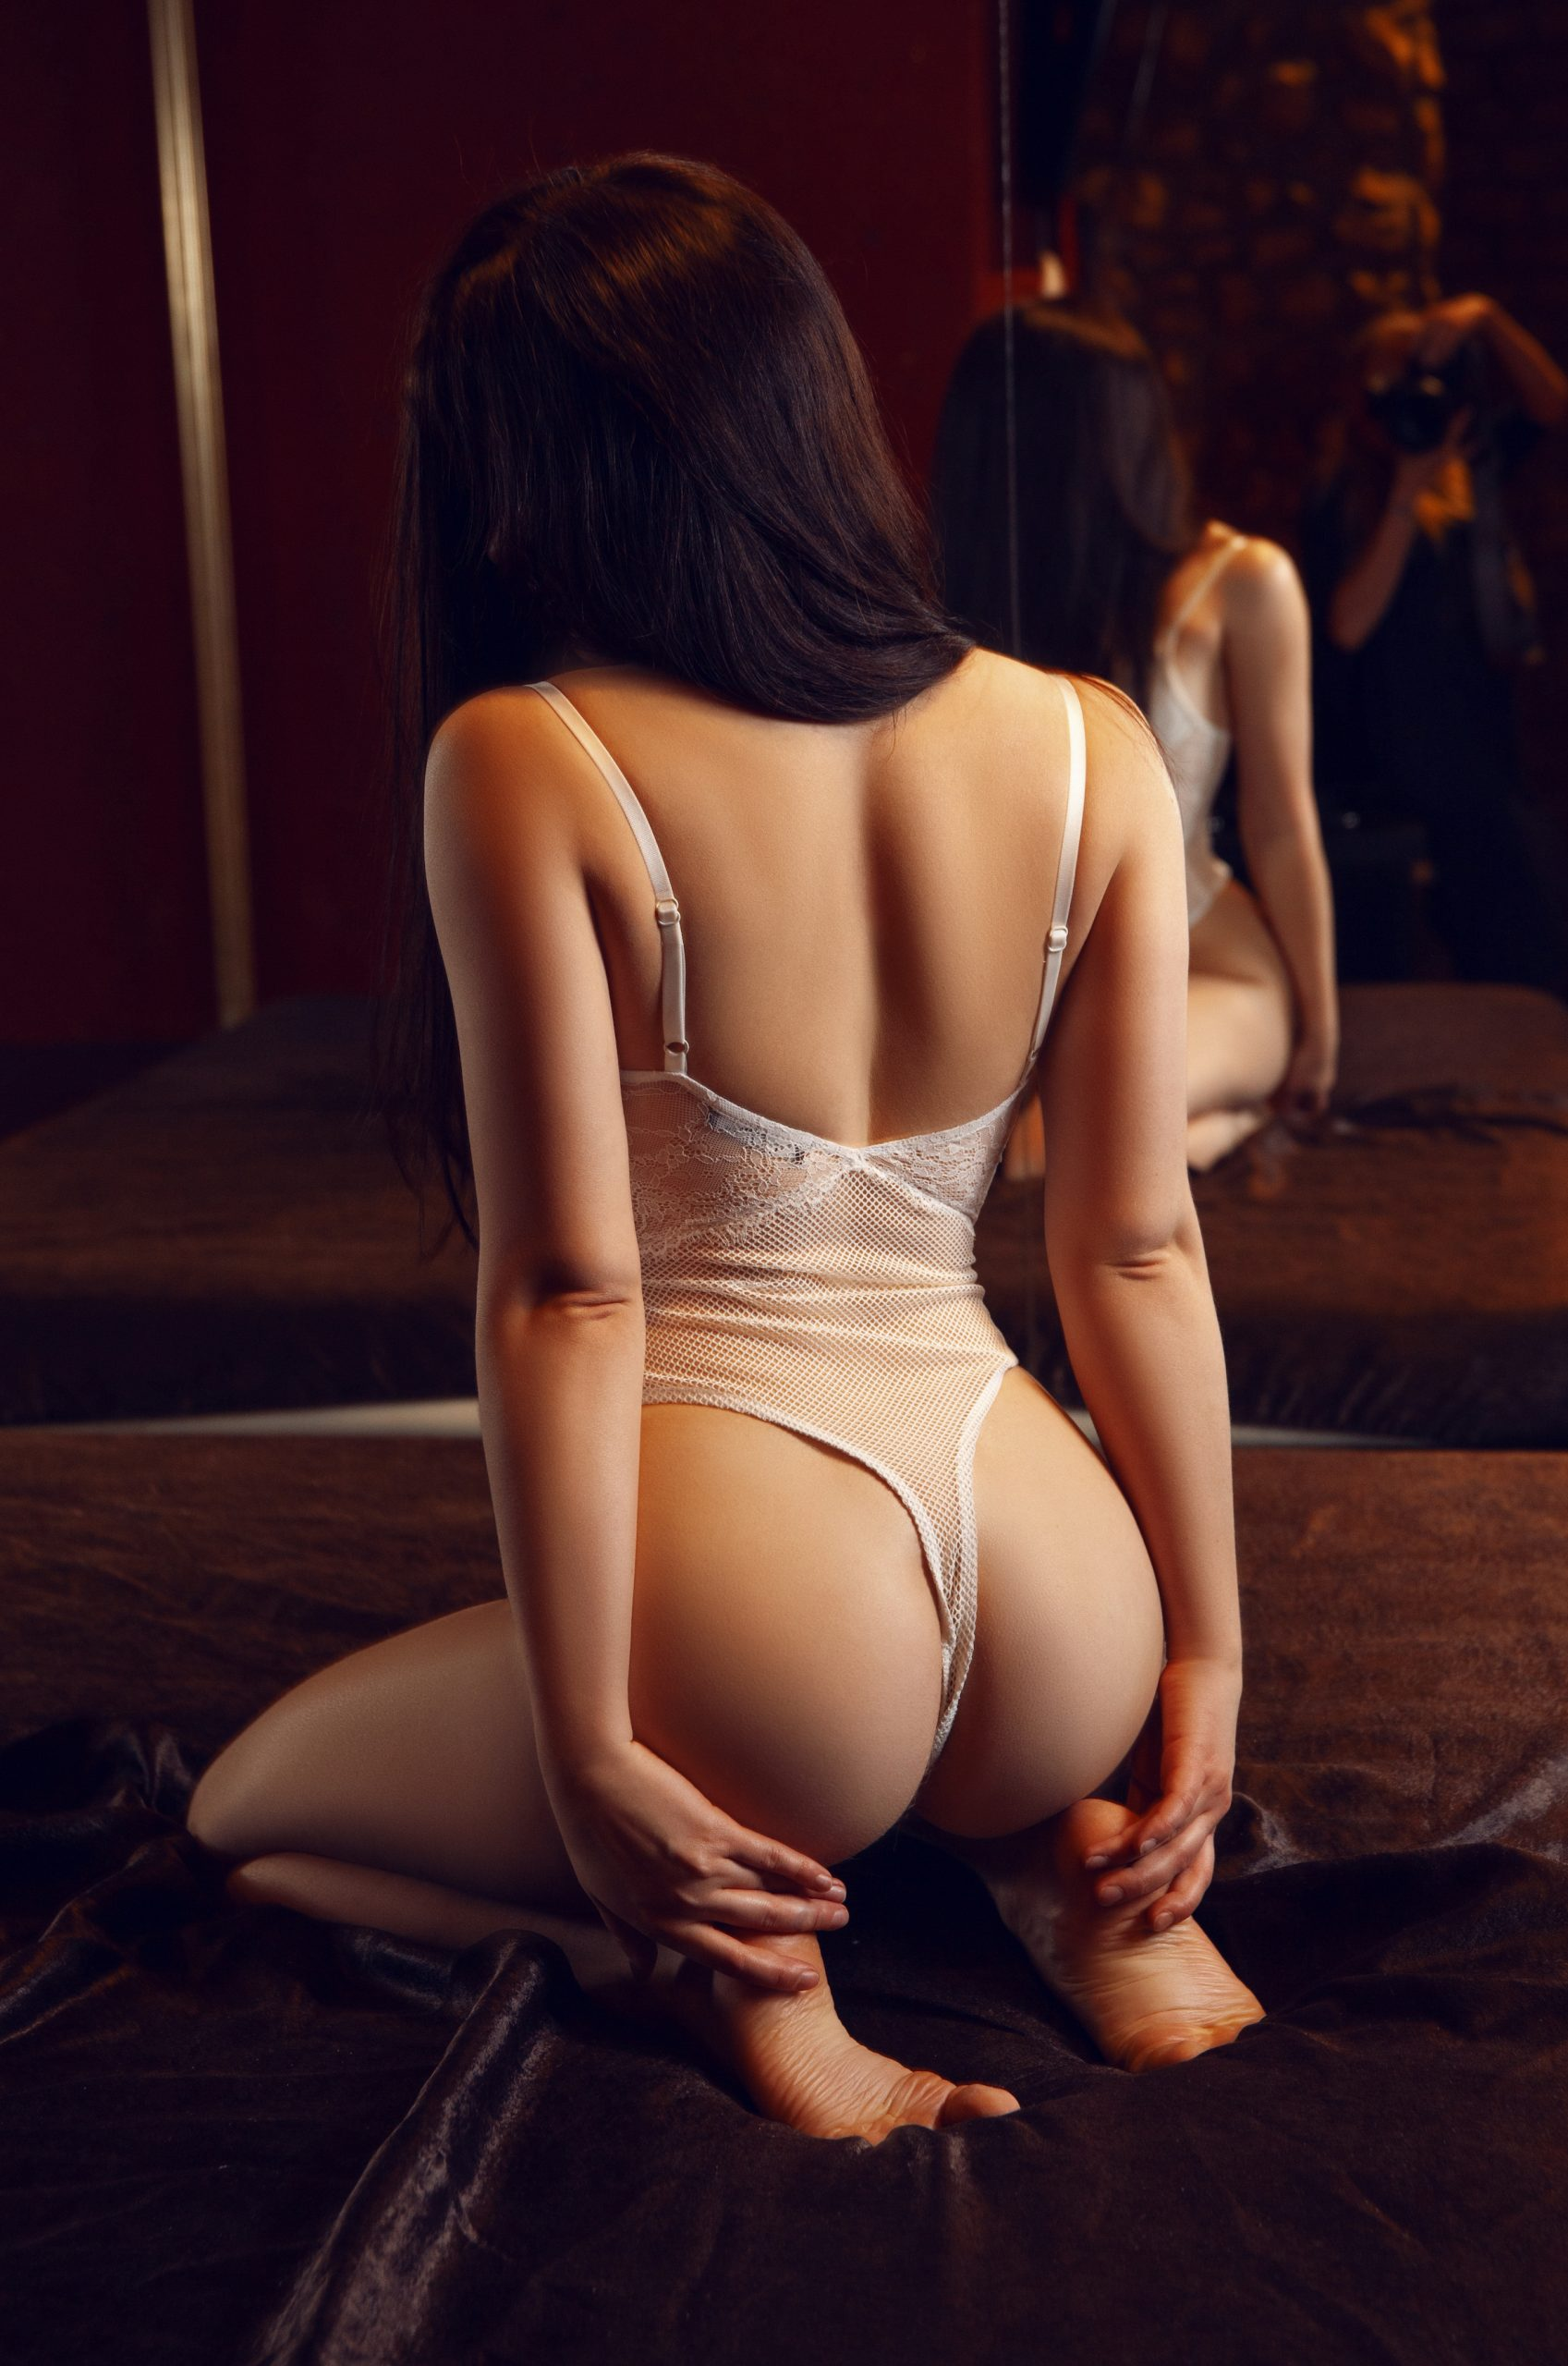 Chloe erotic massage Prague